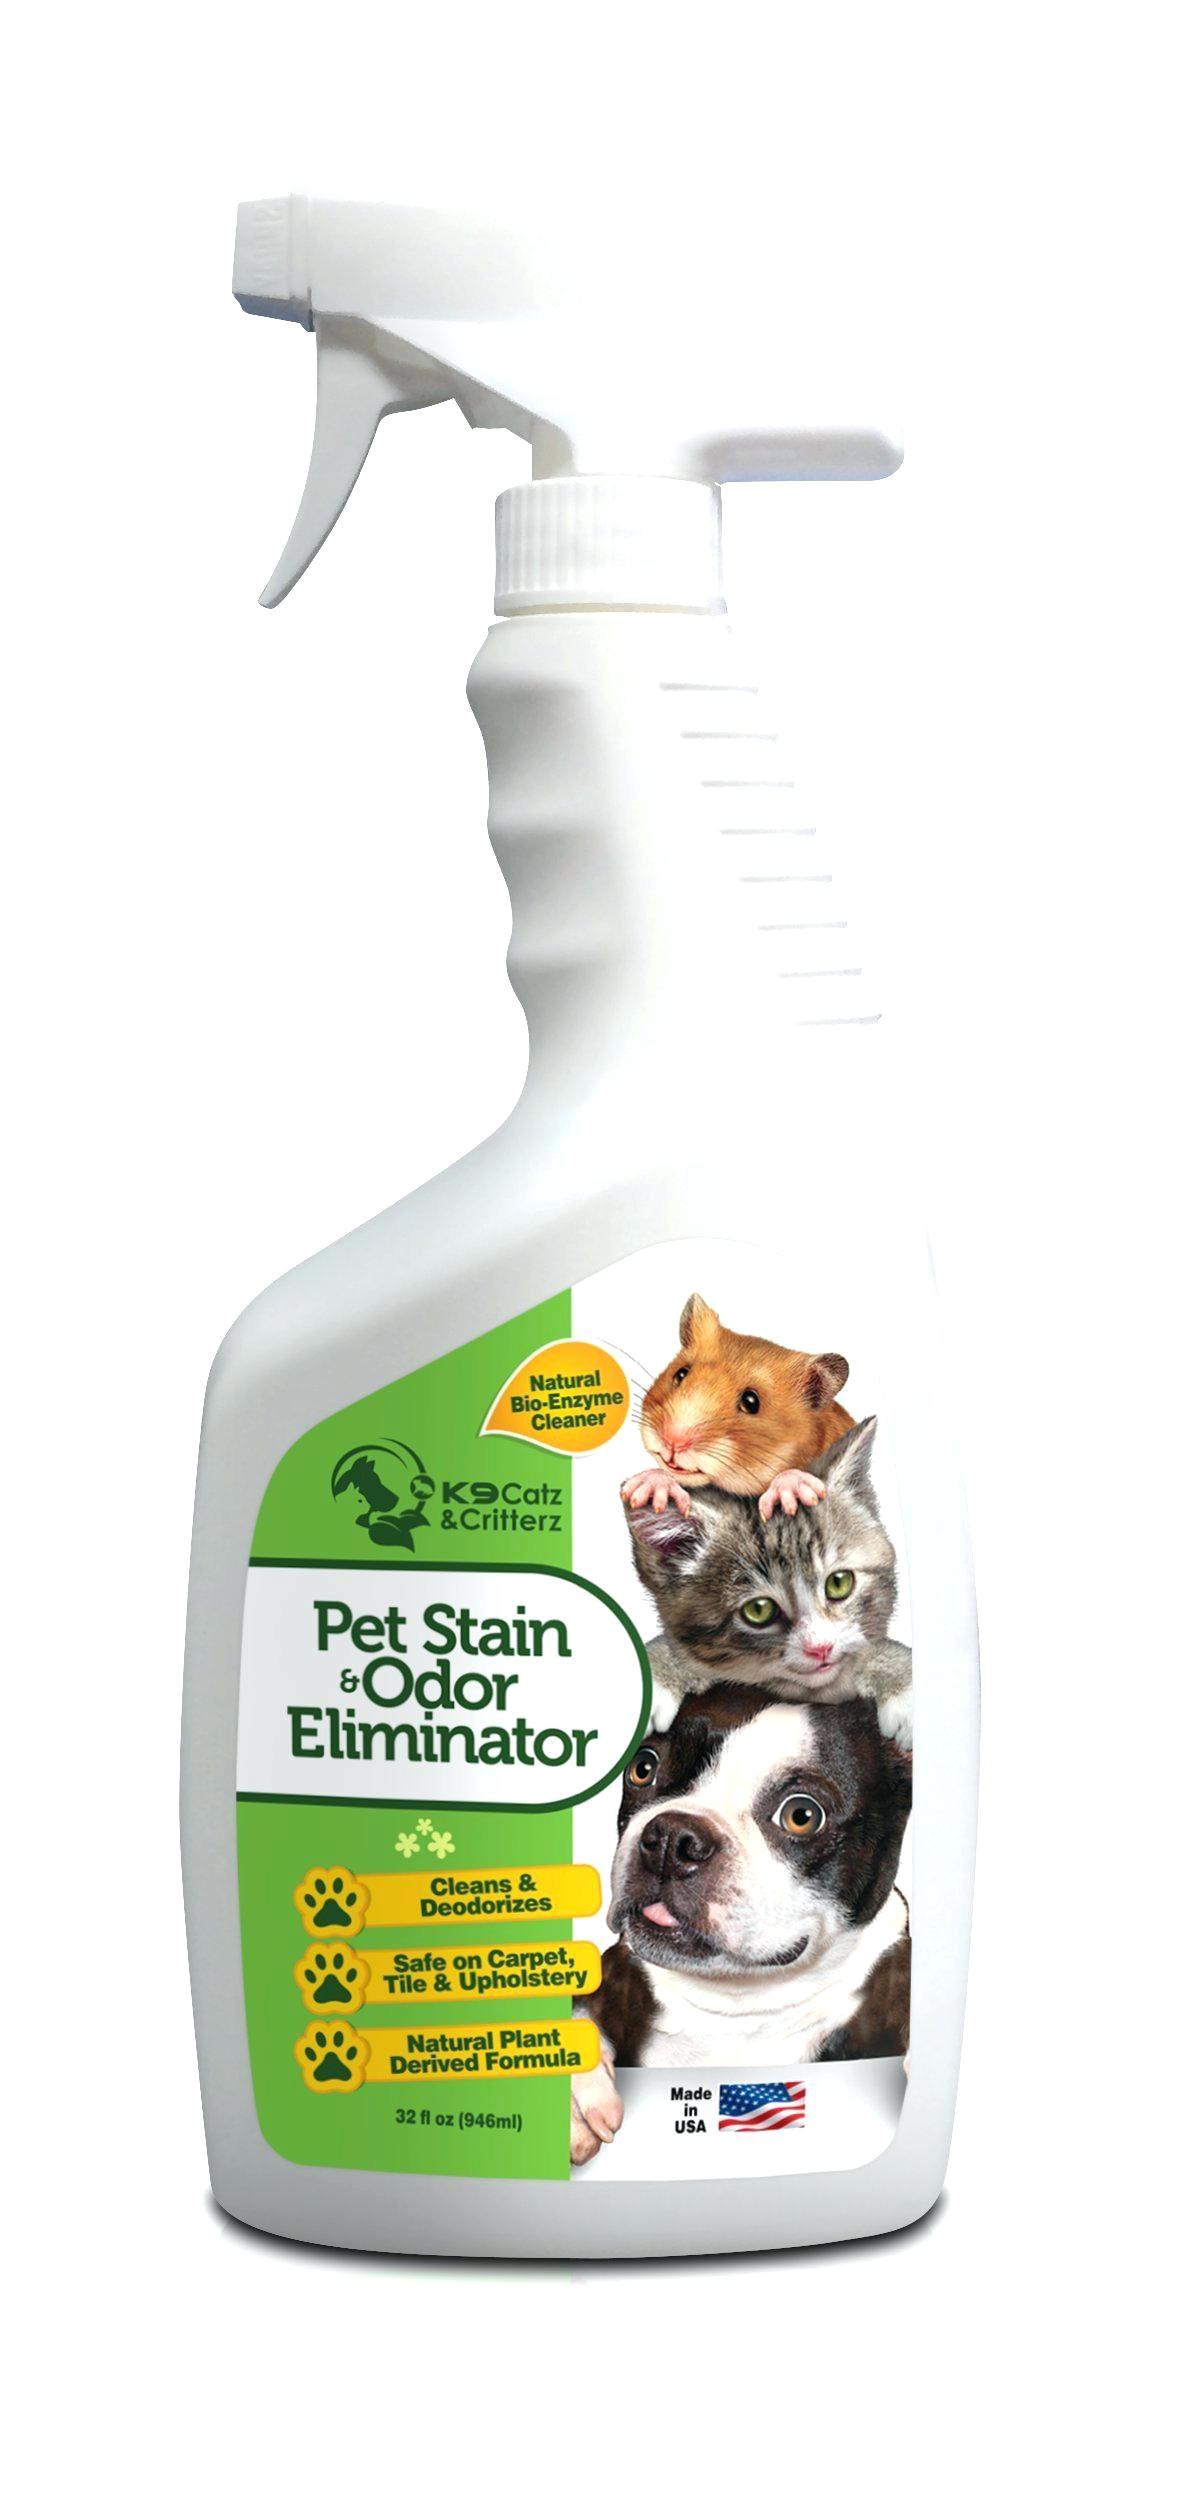 Tile Floor Cleaners Walmart Rug Doctor Walmart Reviews Best Of Pet Stain Carpet Cleaner Od